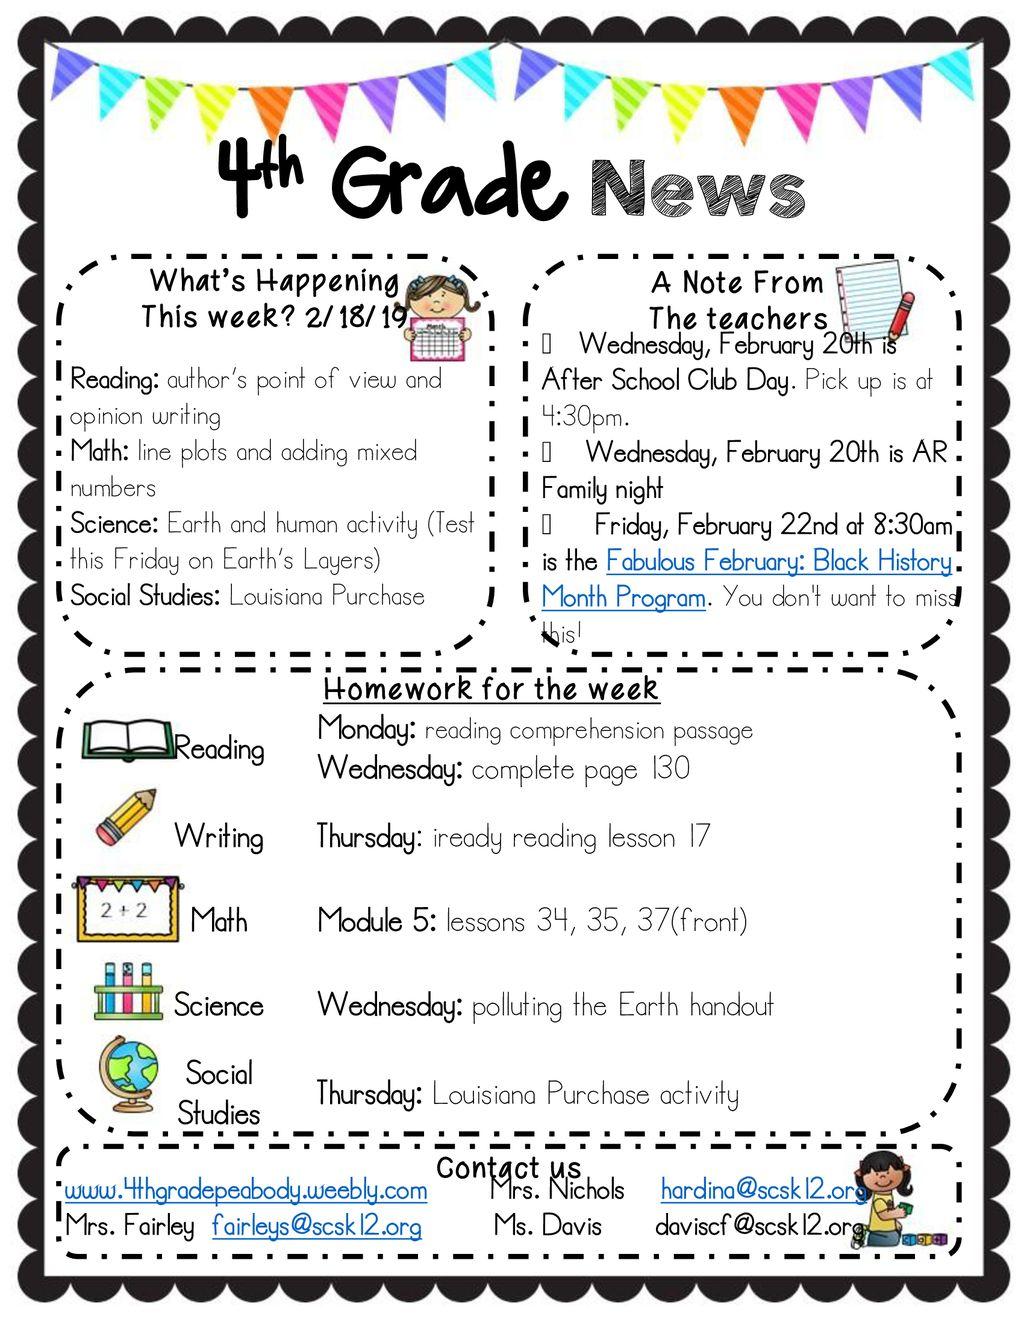 - 4th Grade News Reading Monday: Reading Comprehension Passage - Ppt